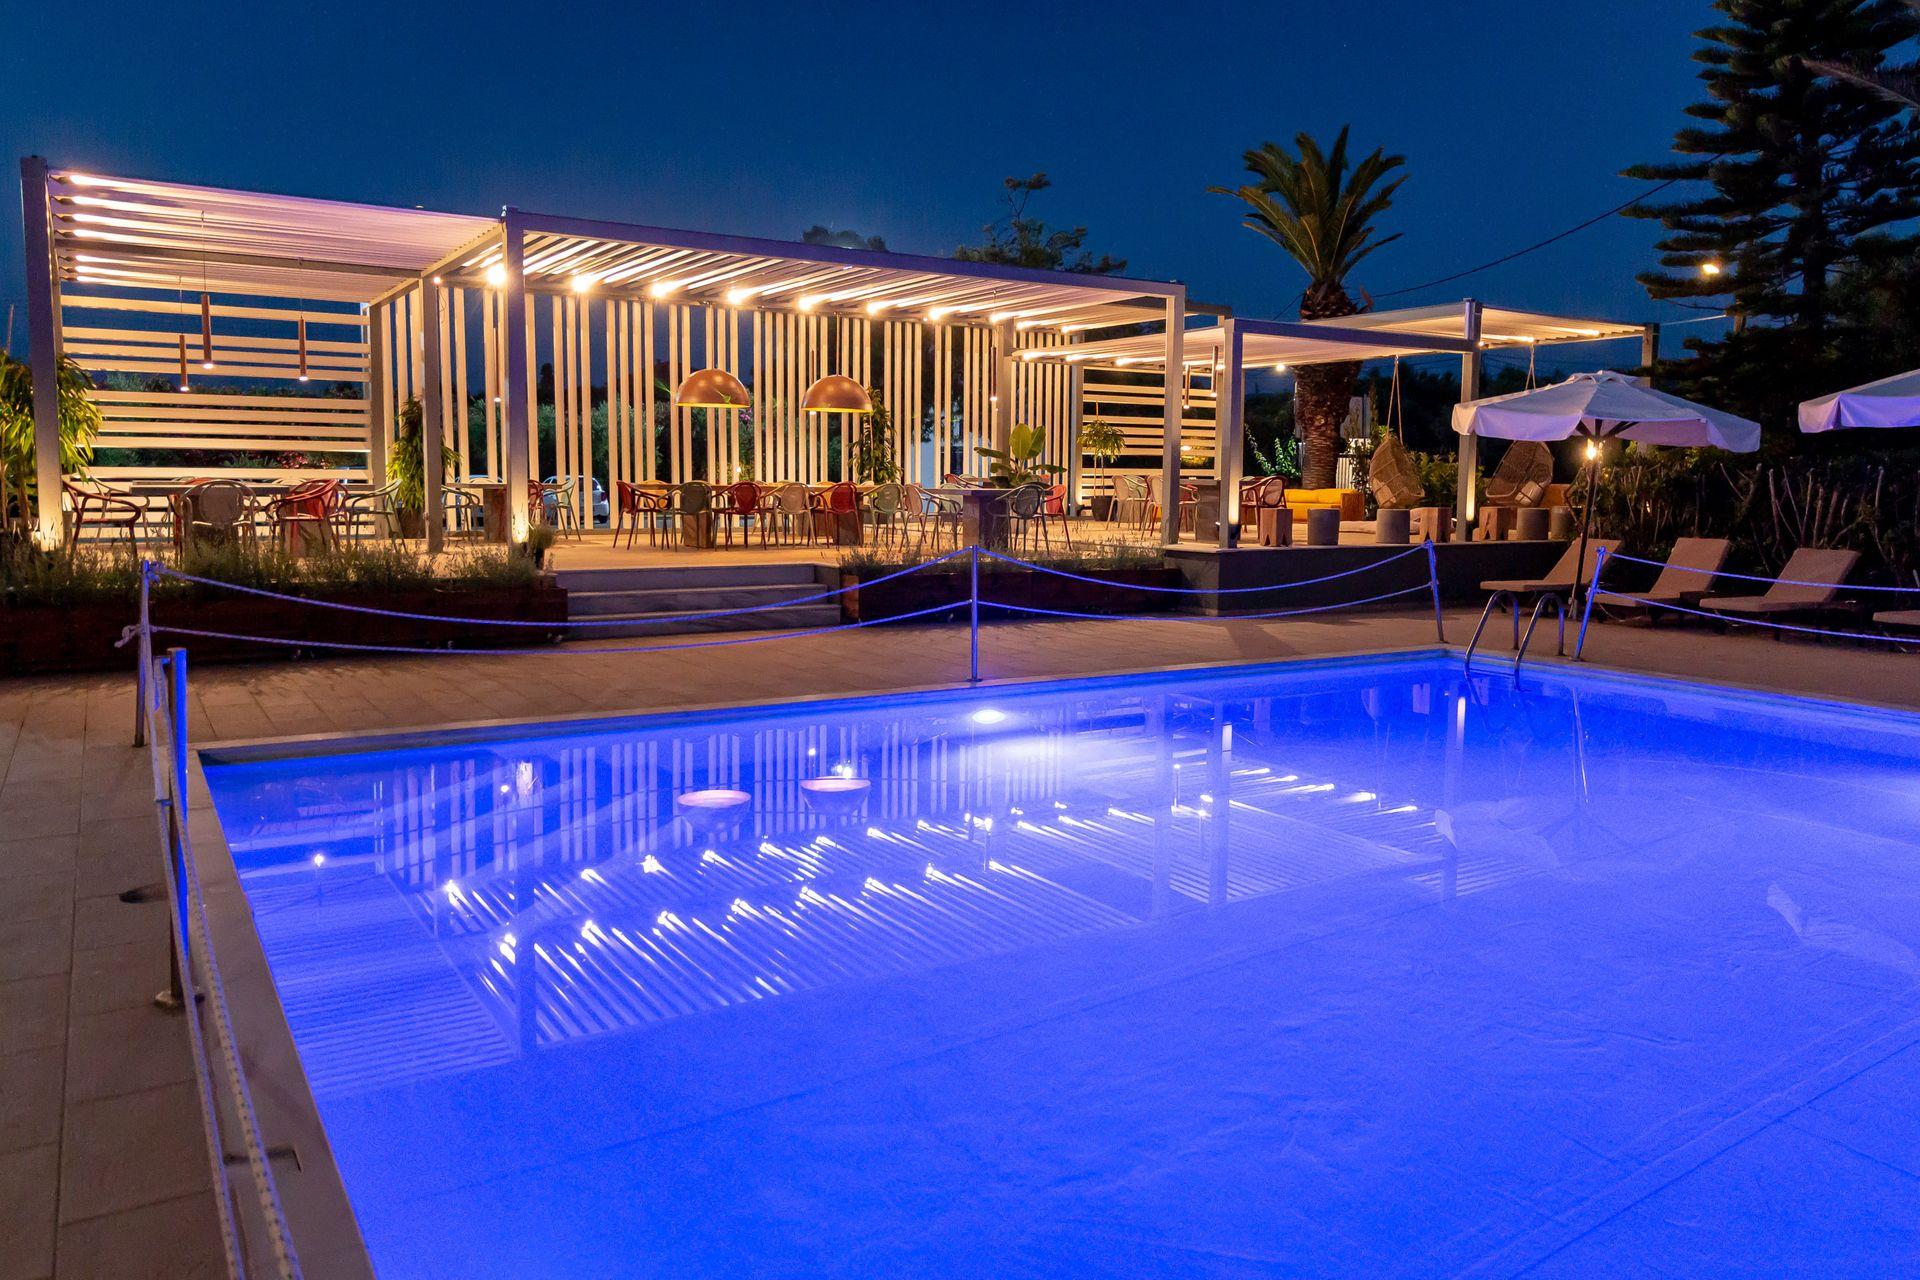 4* Apollo Resort Art Hotel - Κυπαρισσία ✦ 2 Ημέρες (1 Διανυκτέρευση) ✦ 2 άτομα ✦ Χωρίς Πρωινό ✦ 01/09/2020 έως 30/09/2020 ✦ Free WiFi